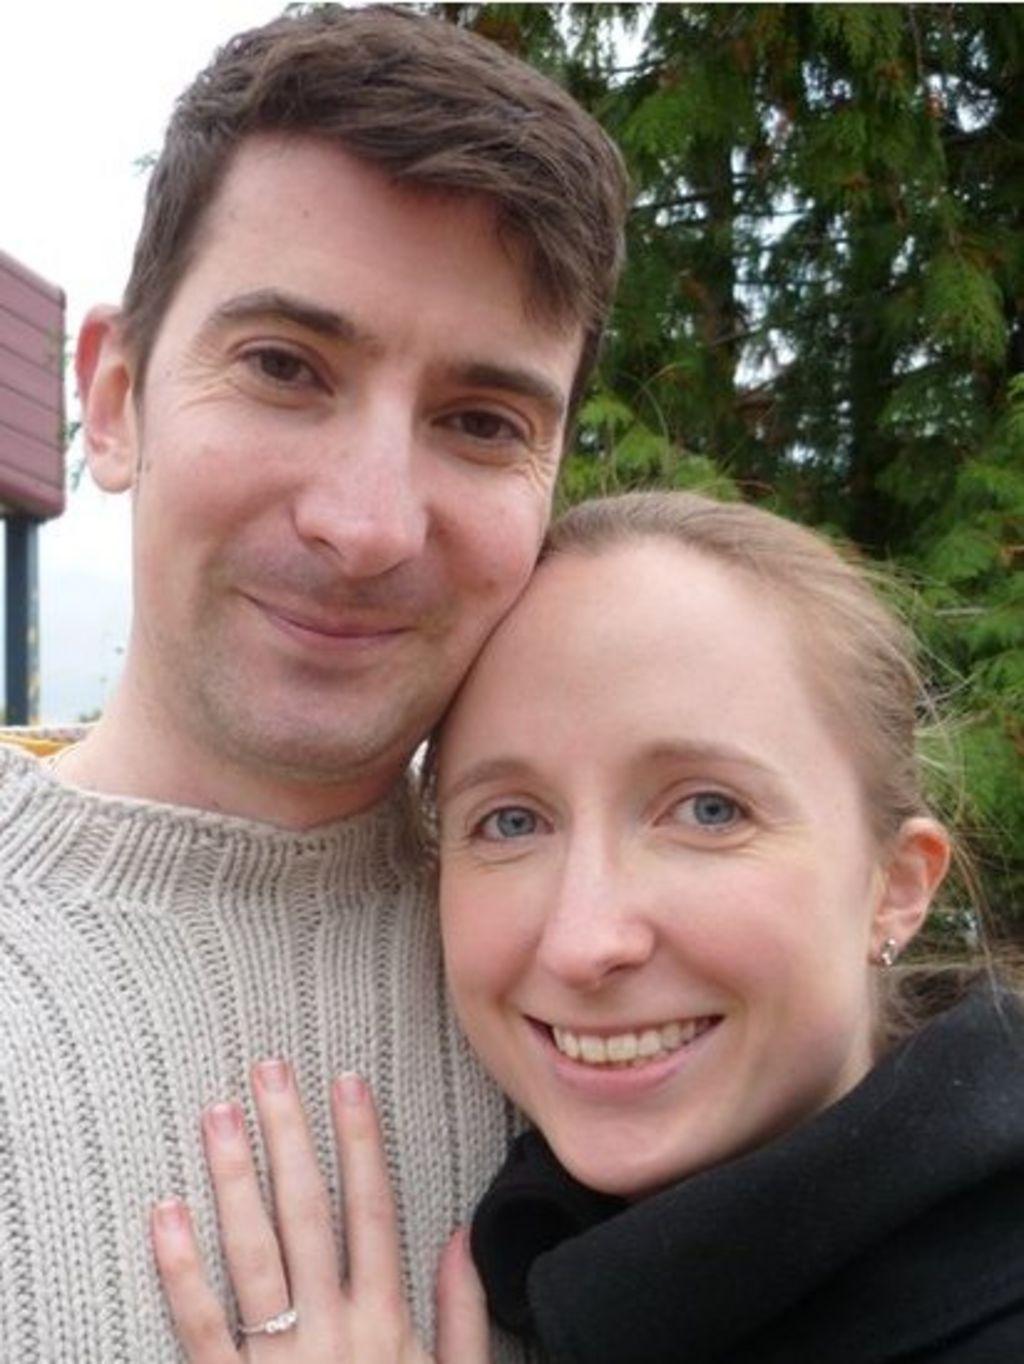 Let me keep my dead husband's sperm' - BBC News